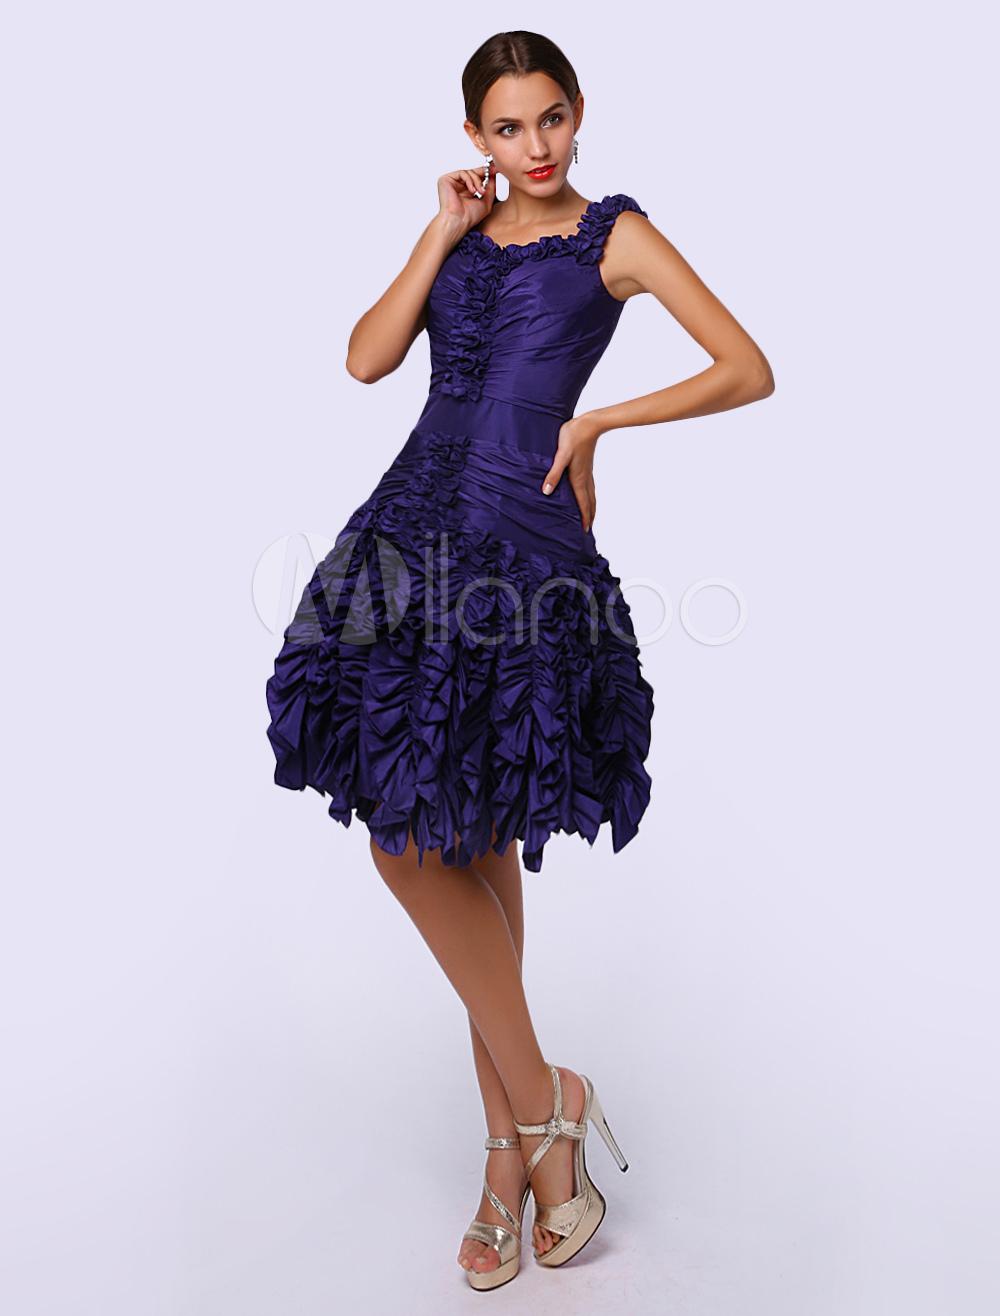 A-line Straps Neck Knee-Length Pleated Taffeta Cocktail Dress